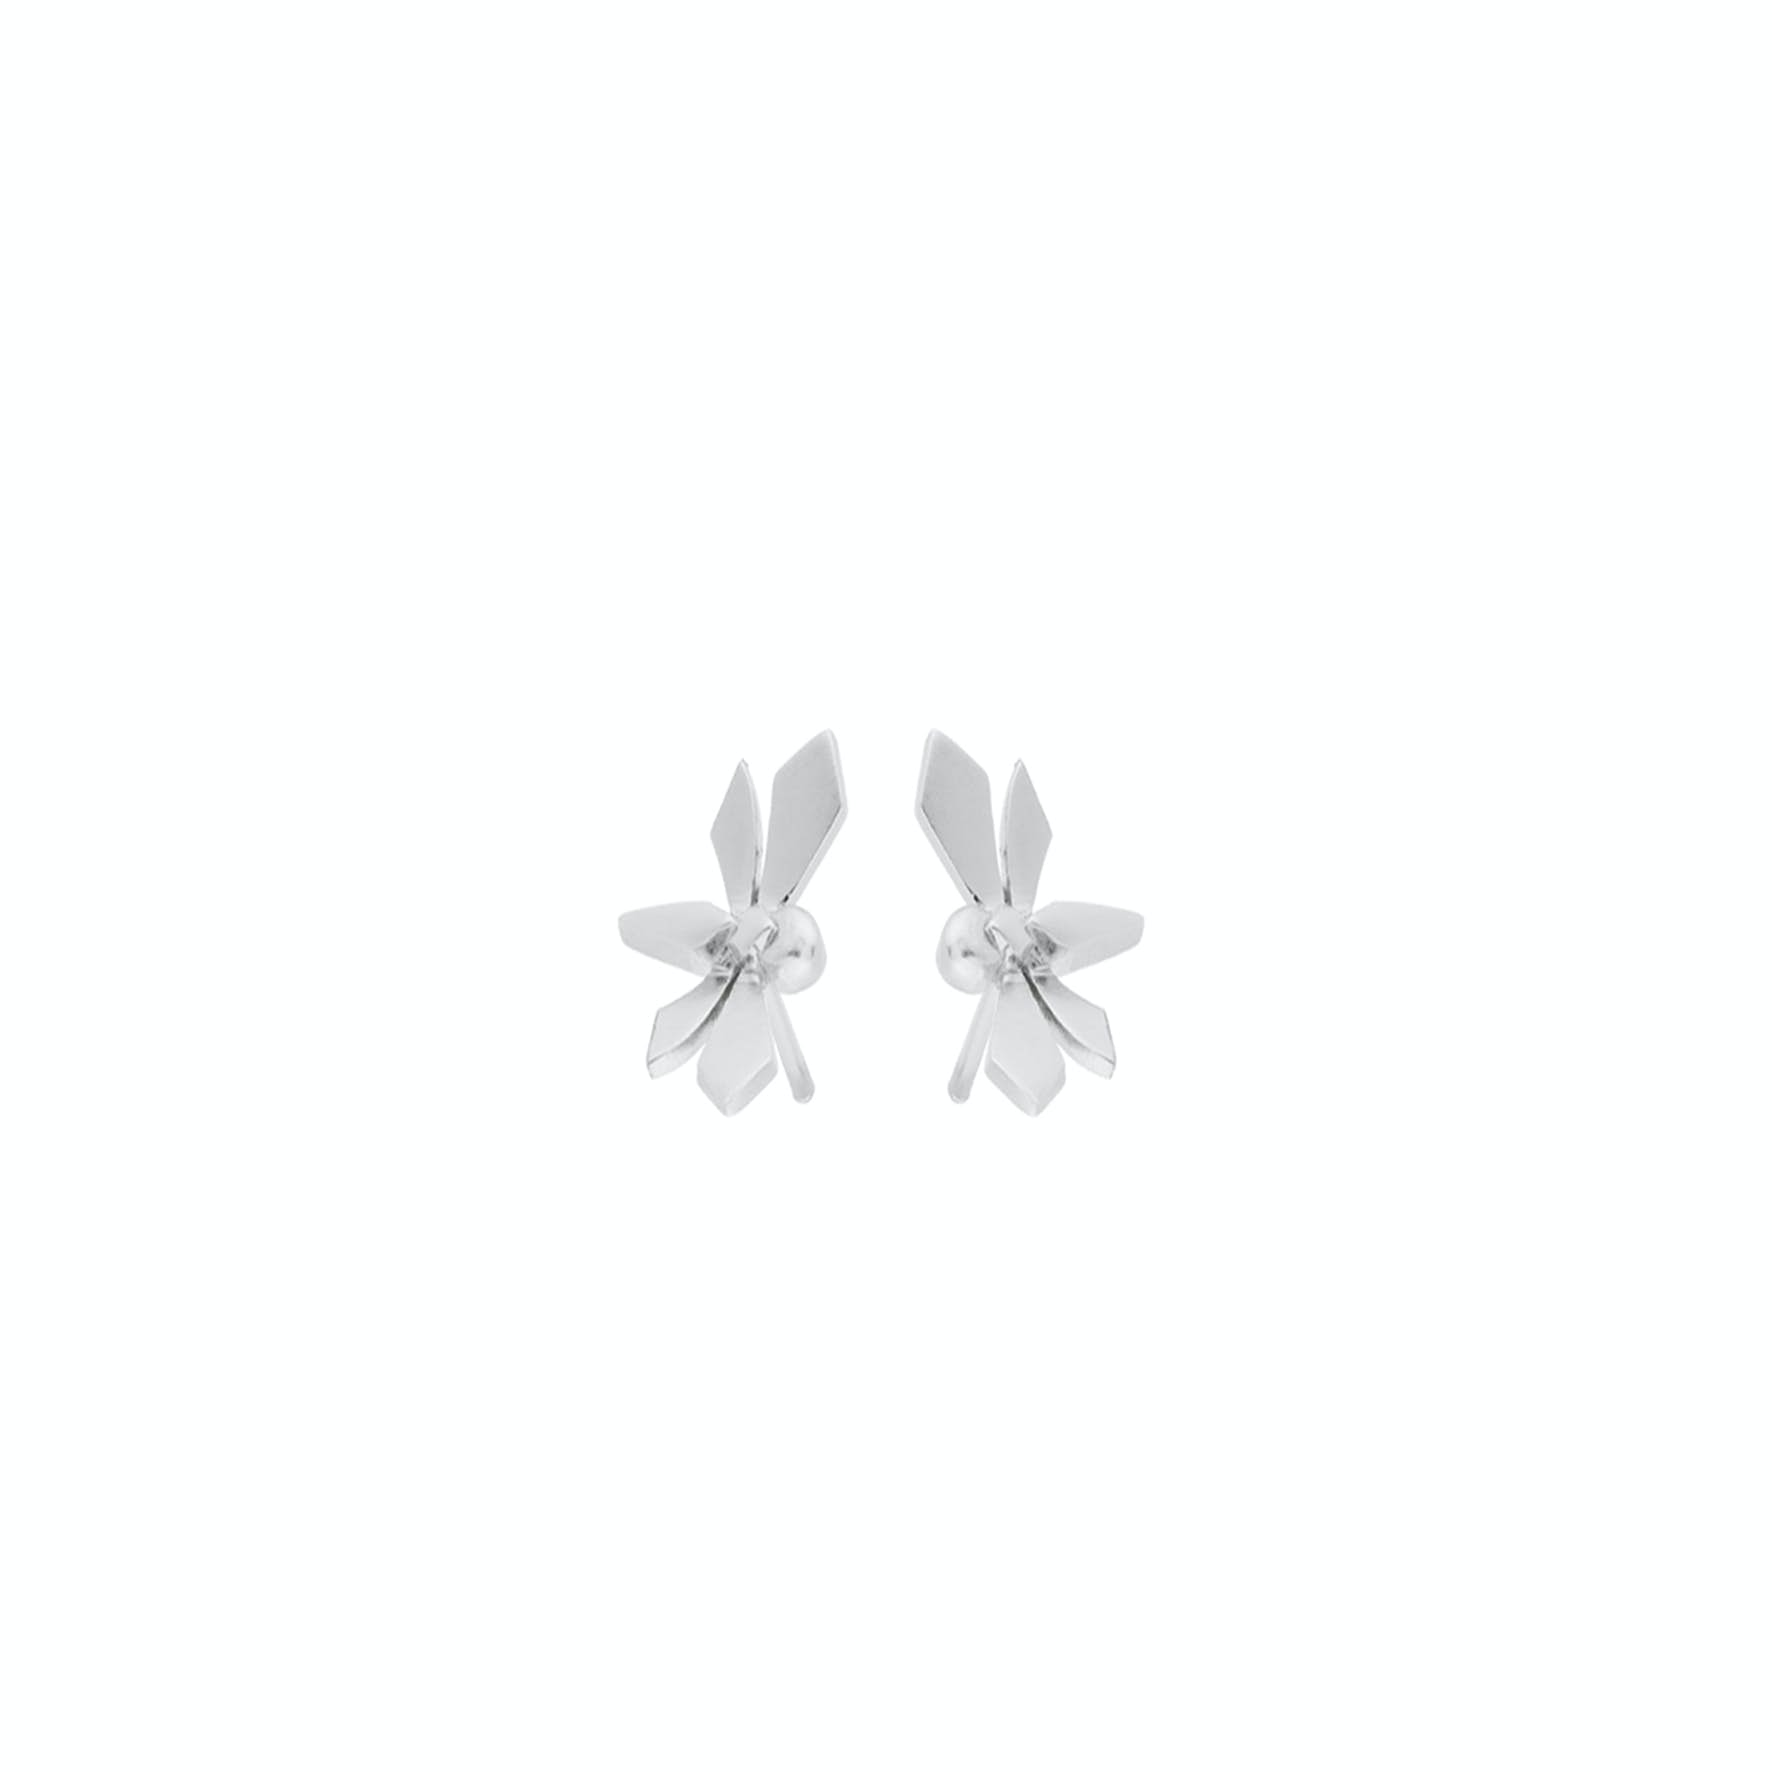 Hover Earsticks from Pernille Corydon in Silver Sterling 925